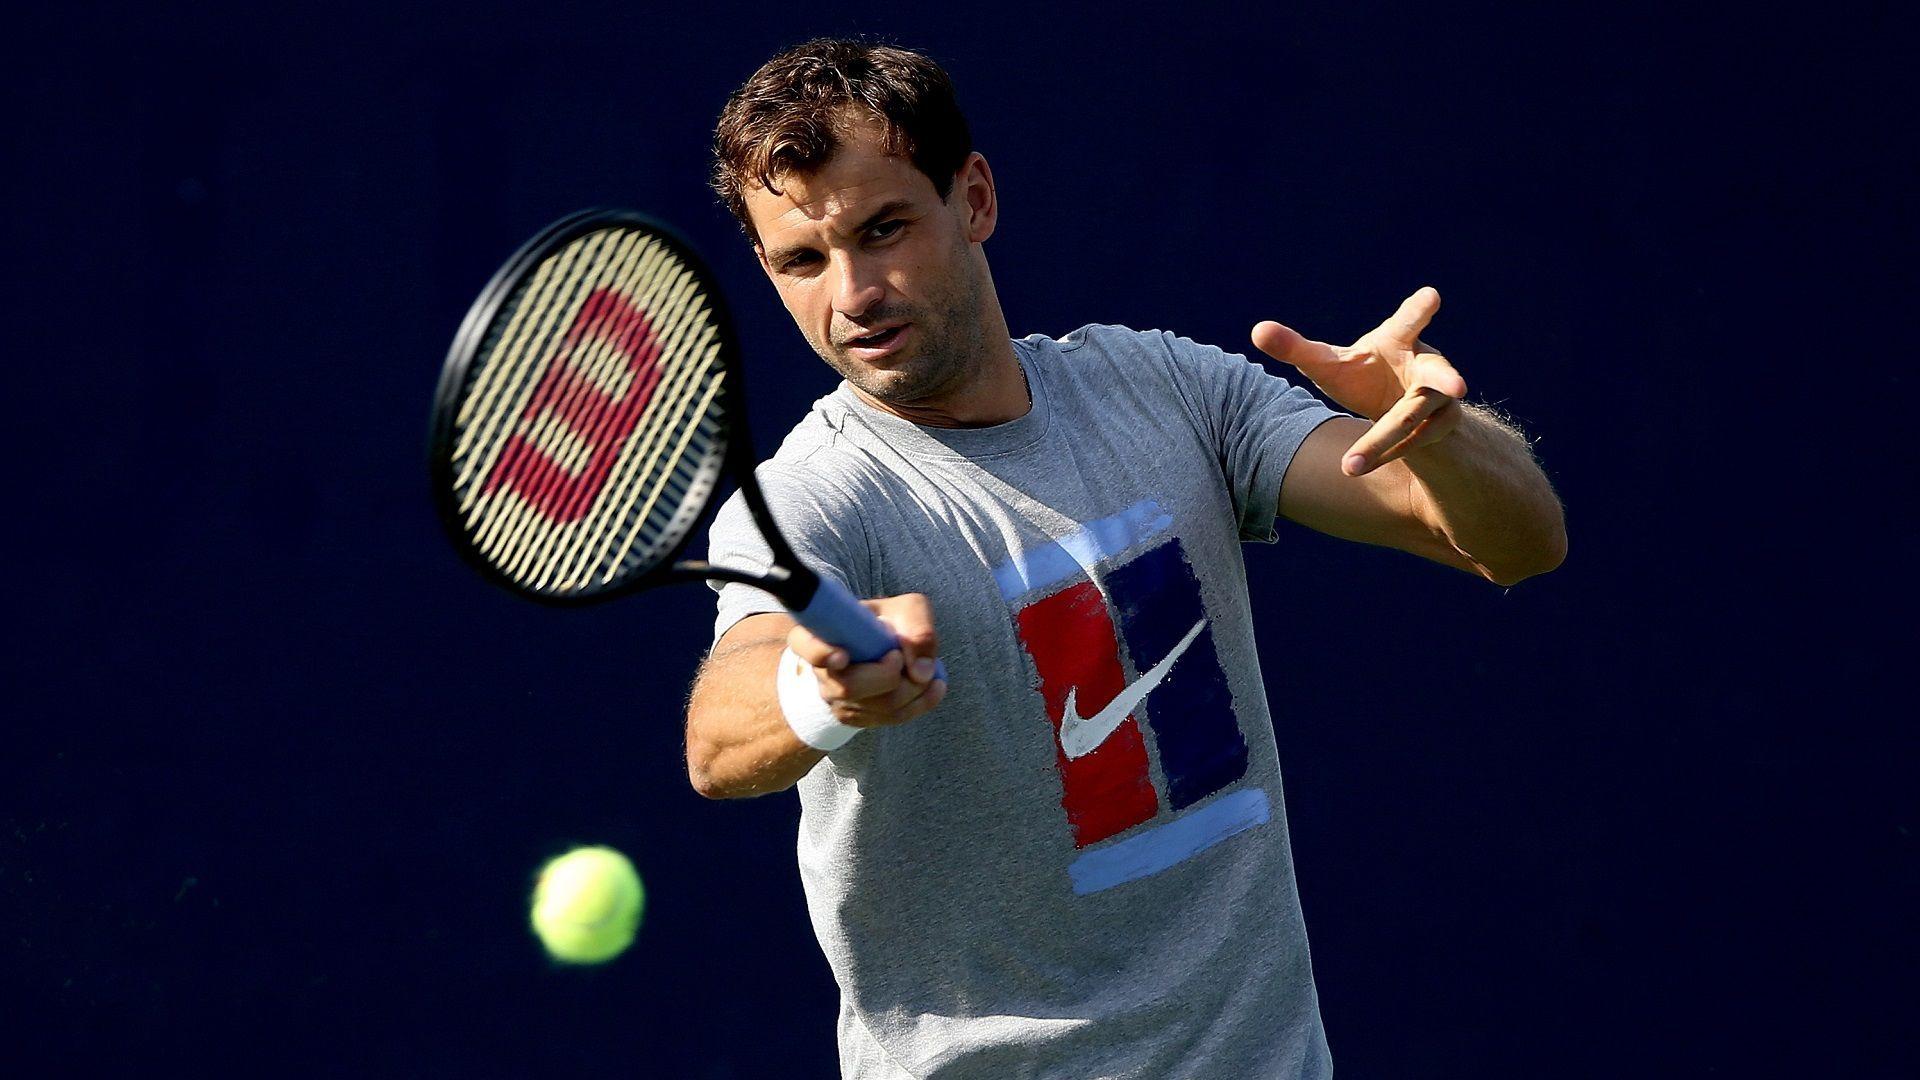 Григор Димитров след победата: Всеки ден се чувствам все по-добре